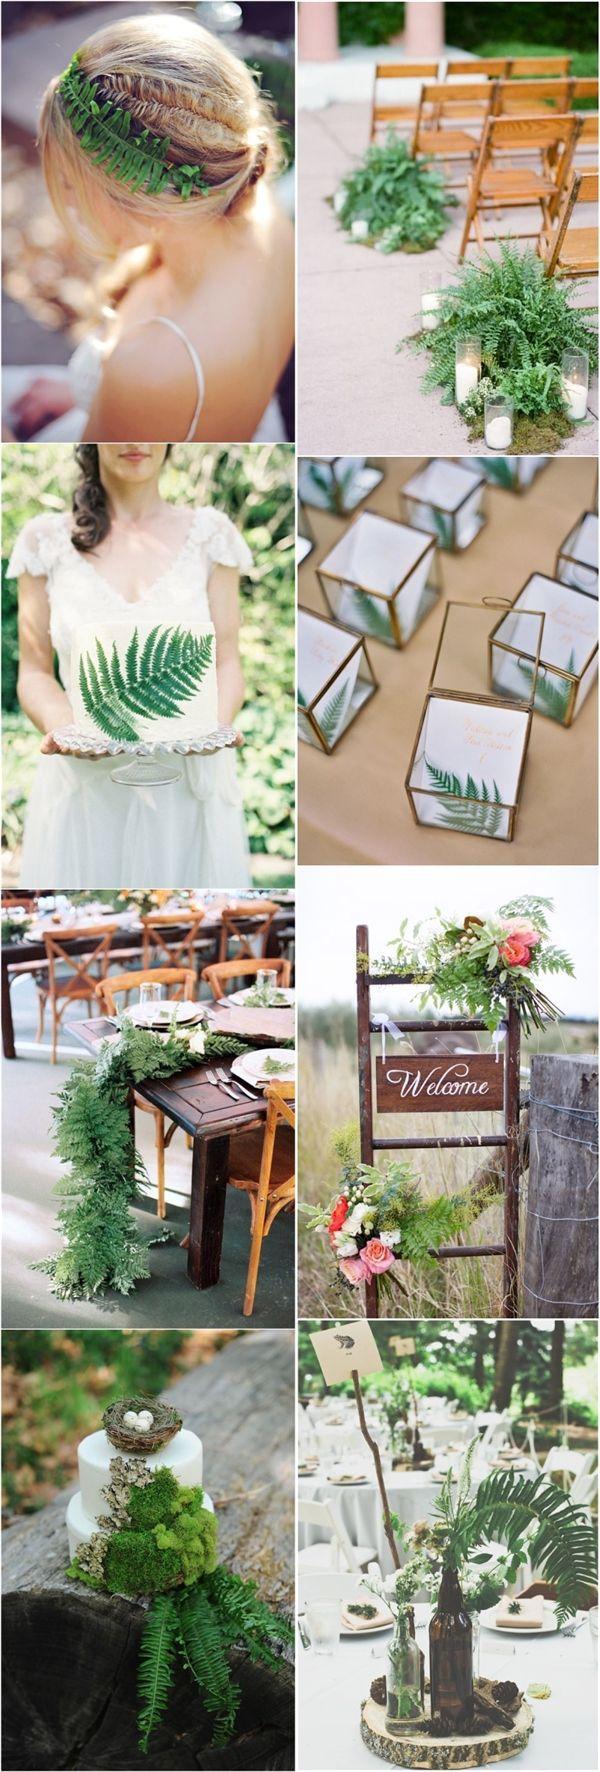 Plant wedding